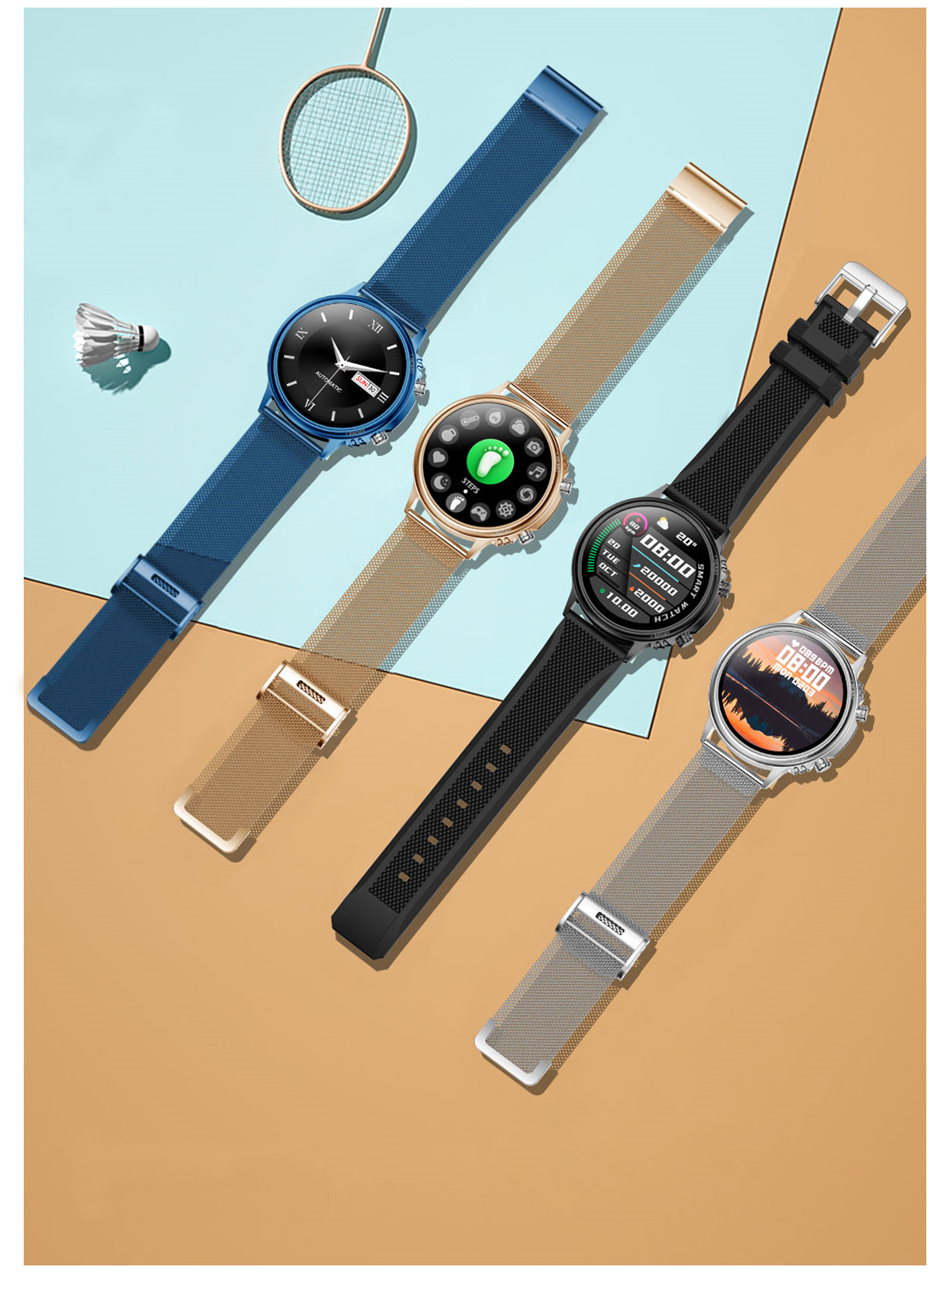 Hda9029c6811f4169b5fe972683ee8c283 LIGE New Smart Watch Men Custom Dial Full Touch Screen Waterproof Smartwatch For Android IOS Sports Smart watch Fitness Tracker